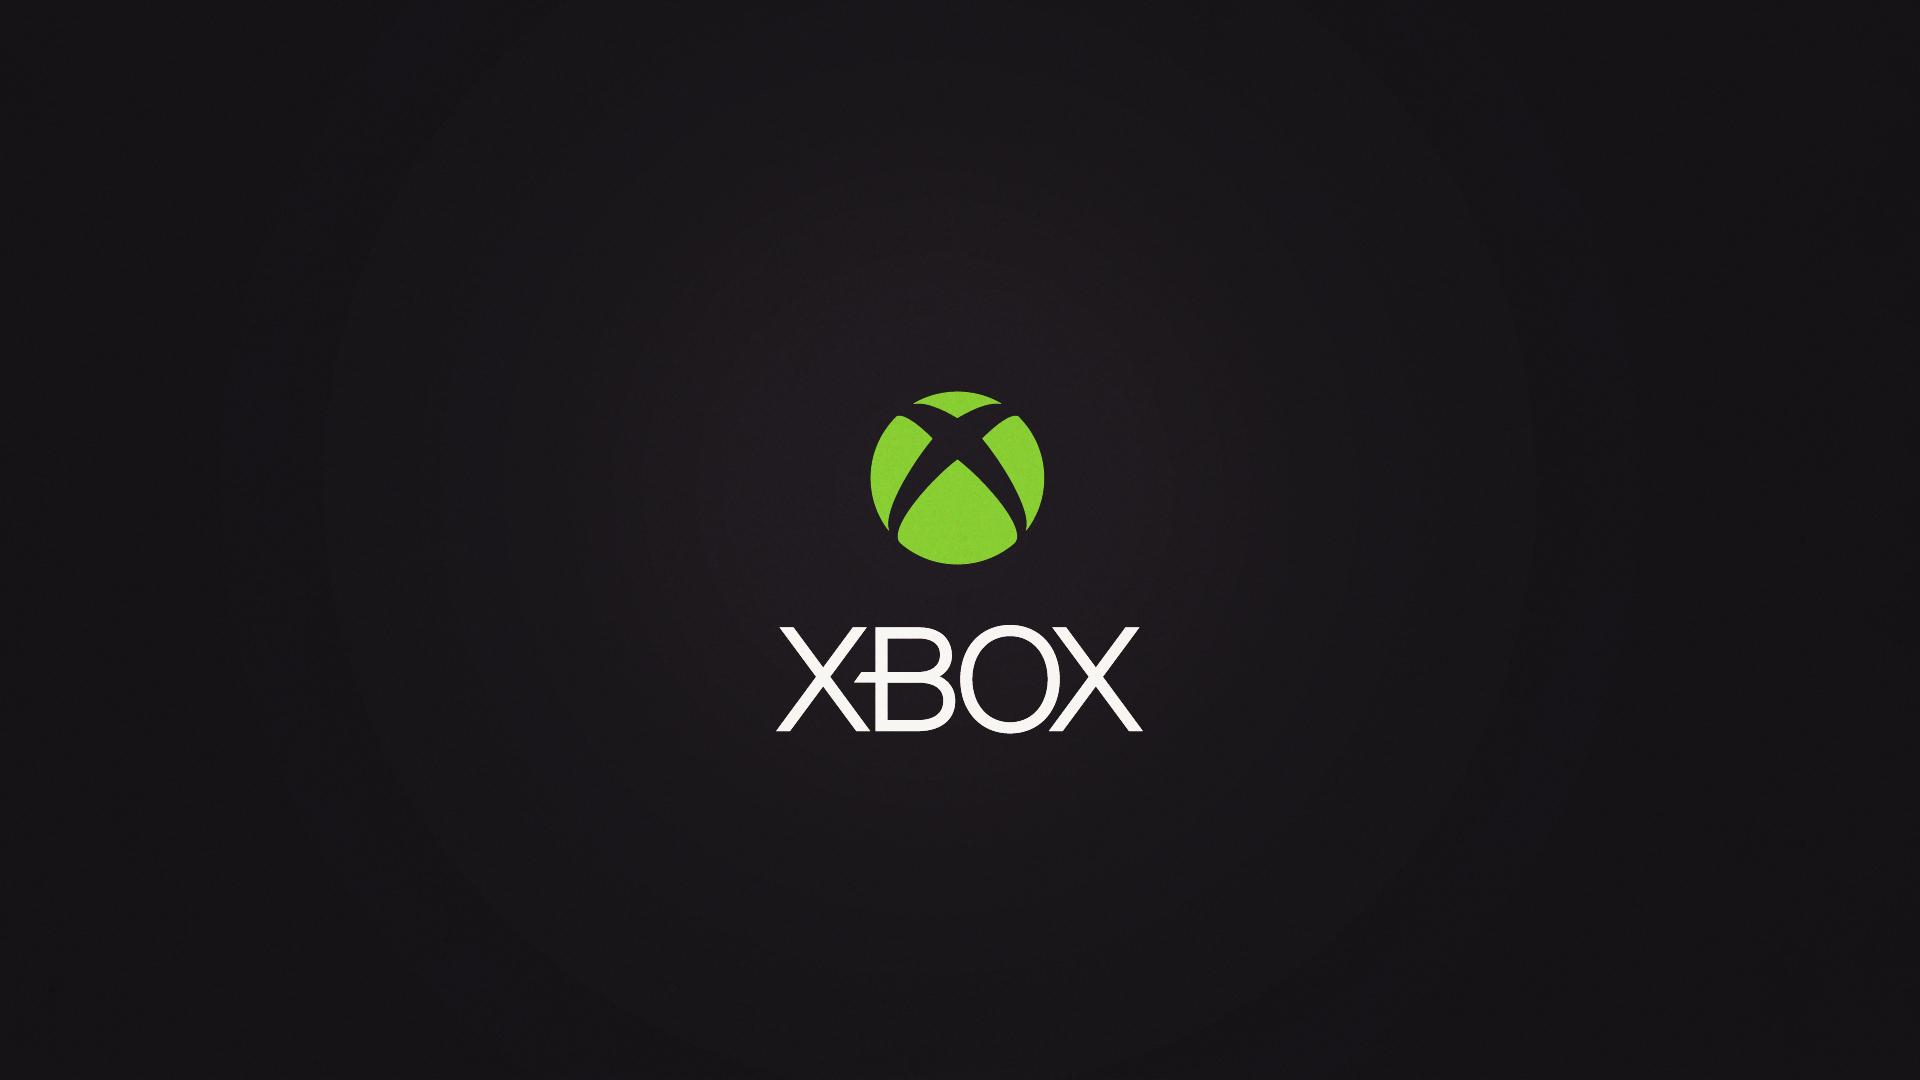 Buck - 2013 - Xbox Pitch Frame 16.jpg